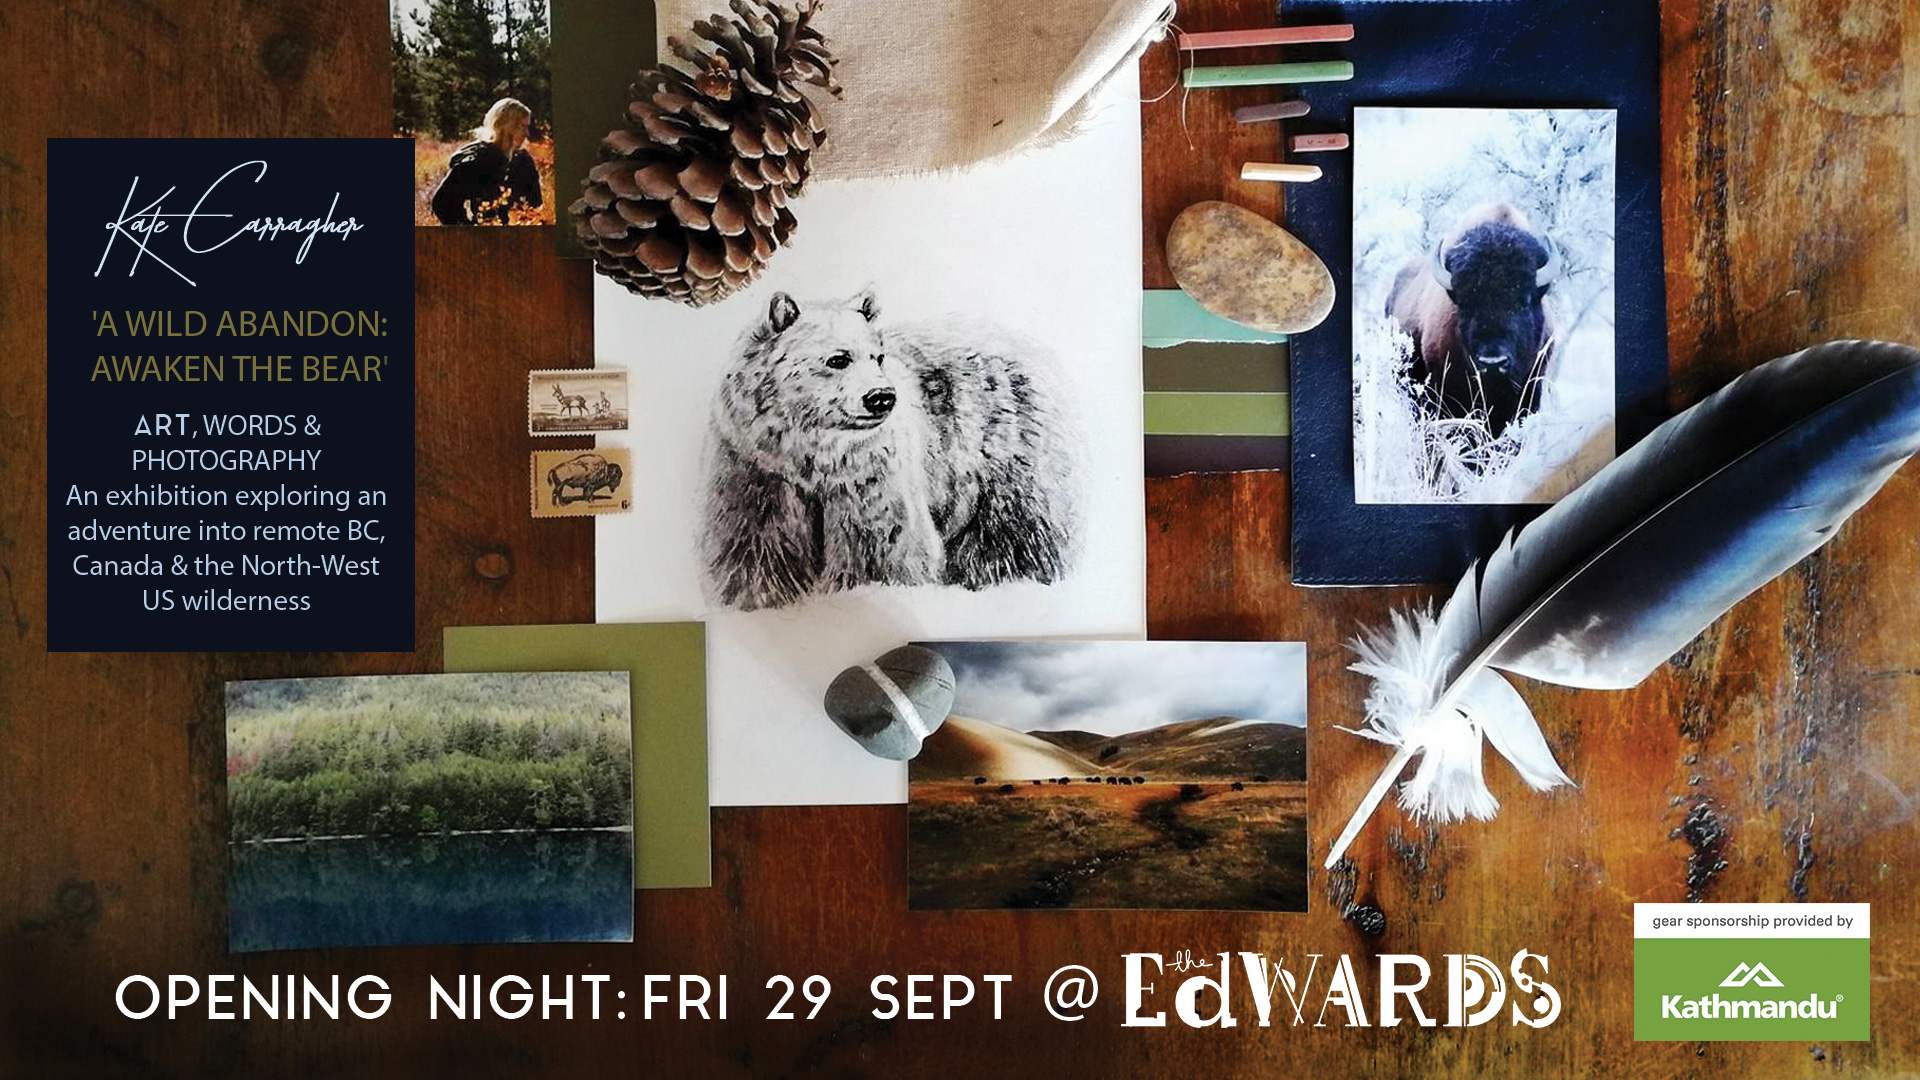 Kate-Carragher-Exhibition_FB-Invite_Web.jpg